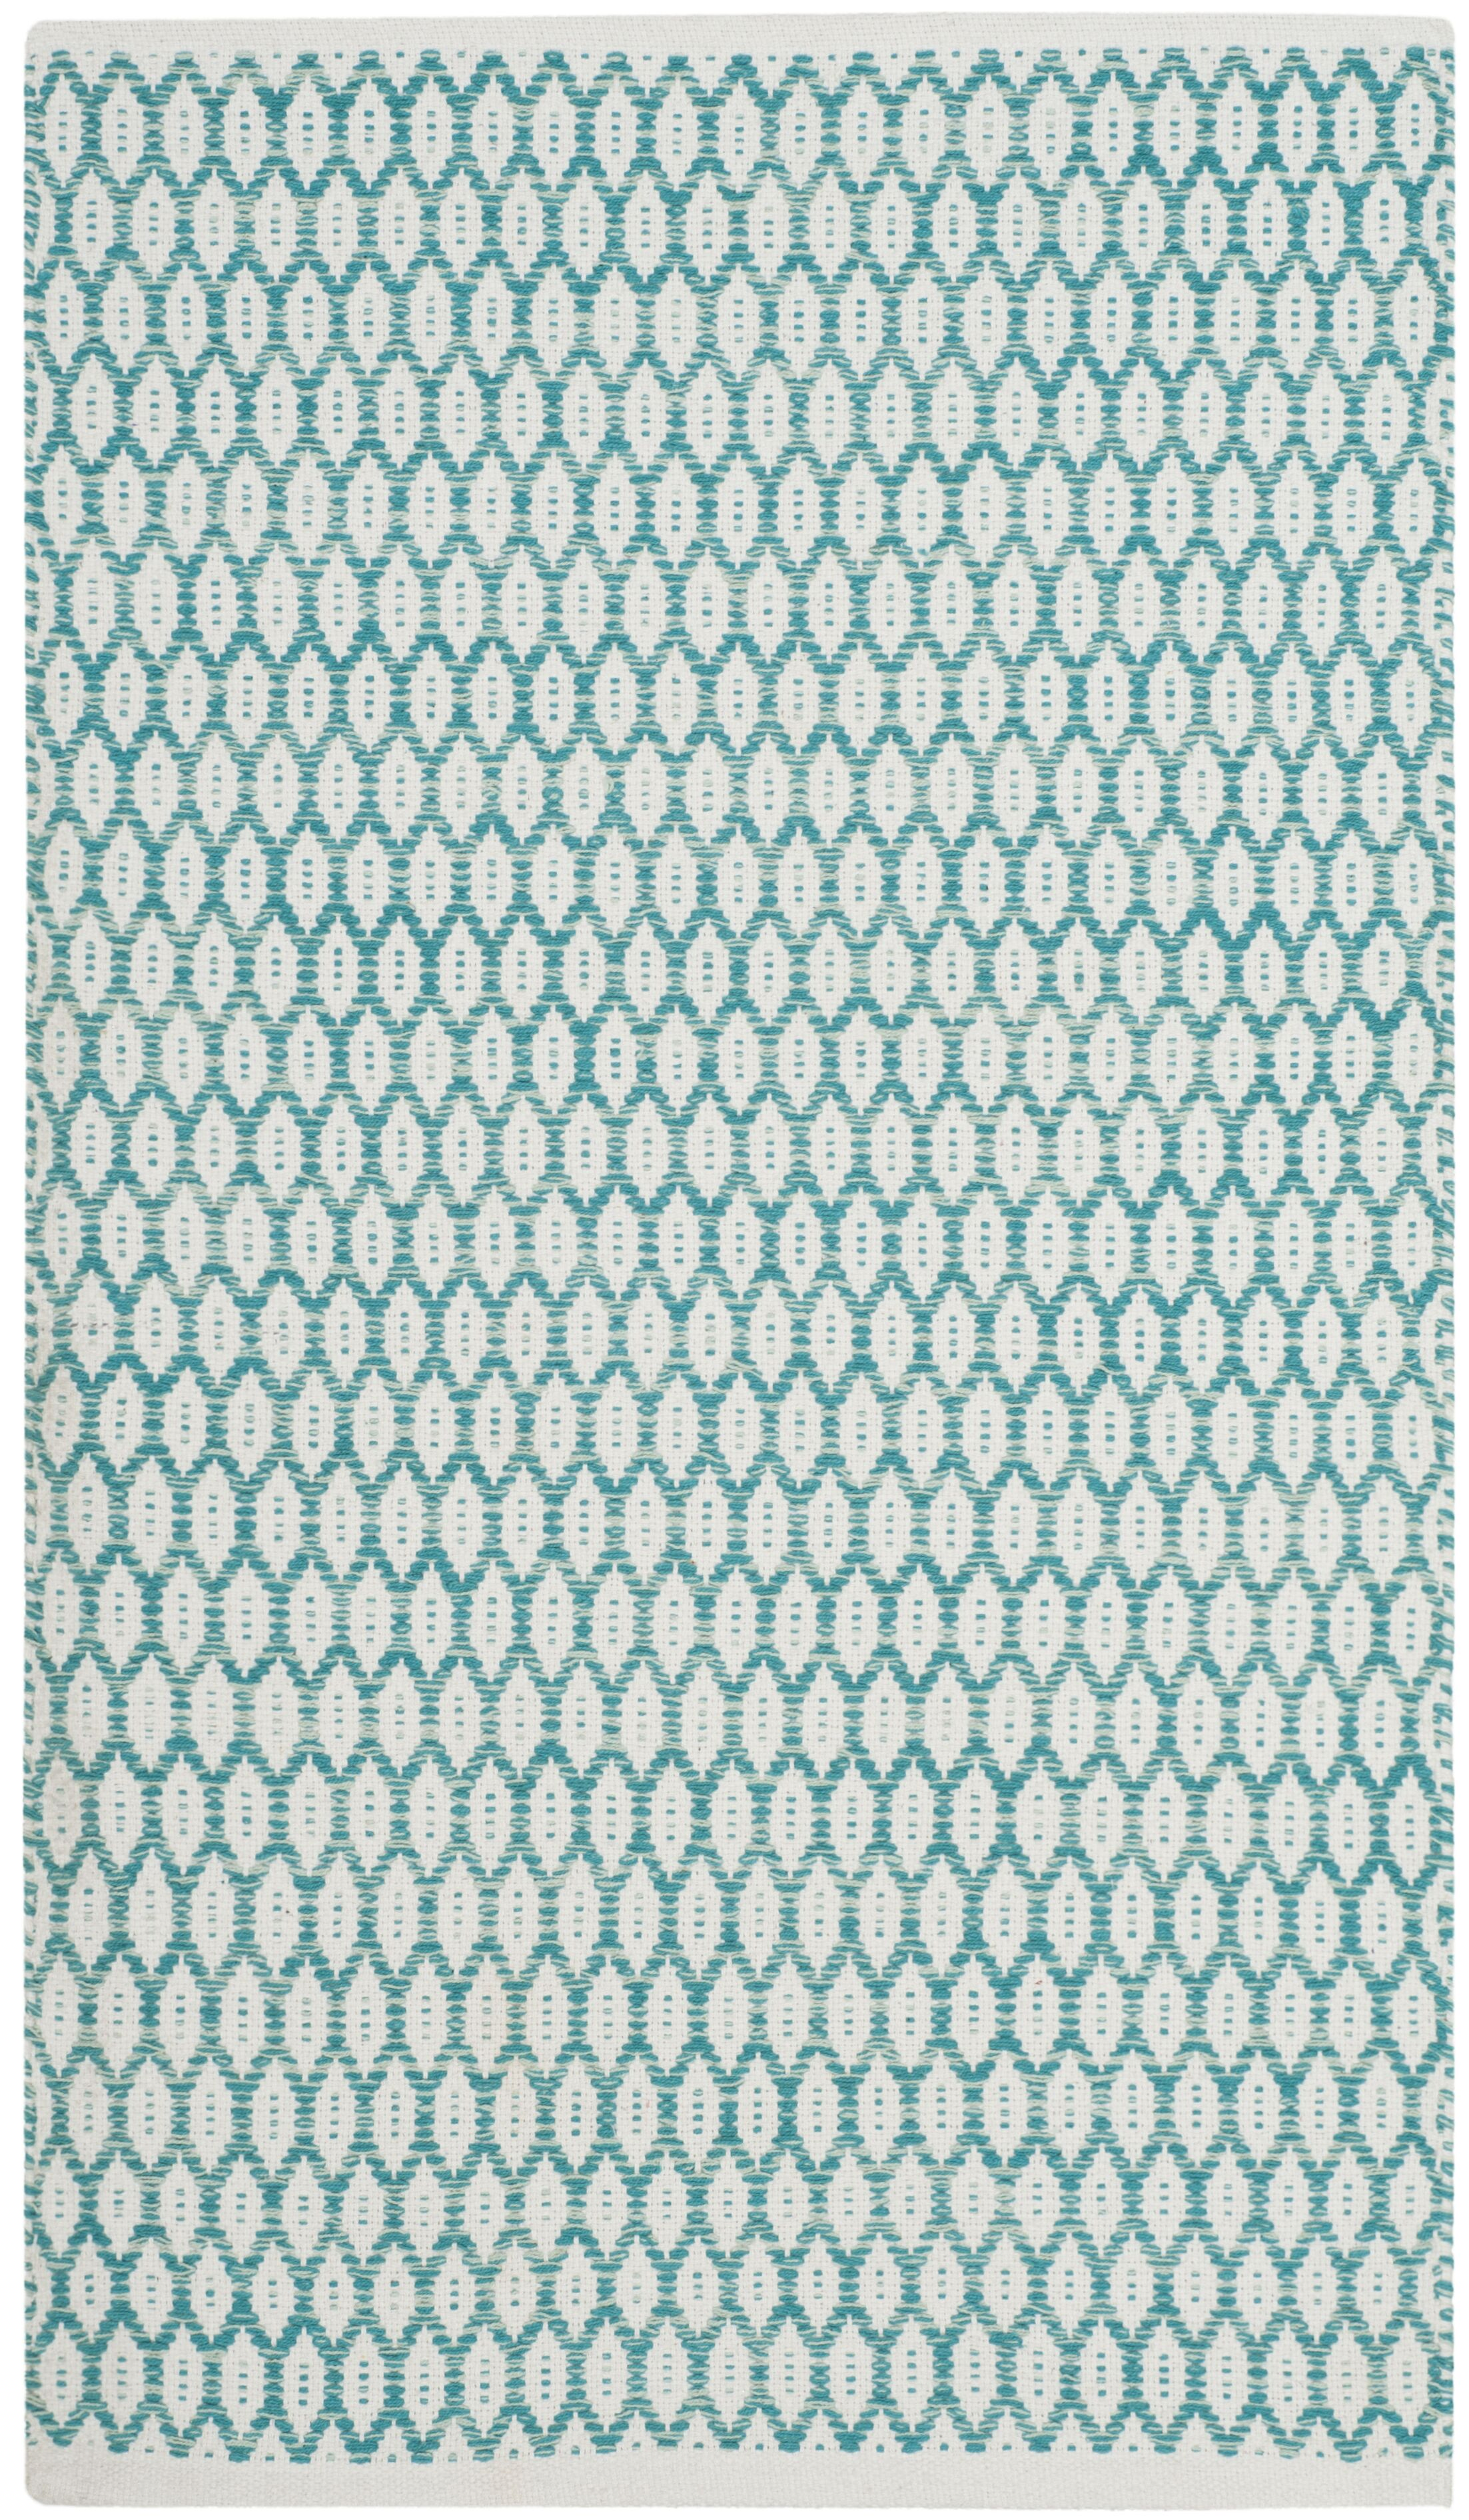 Modena Hand-Woven Aqua/Ivory Area Rug Rug Size: Rectangle 8' x 10'